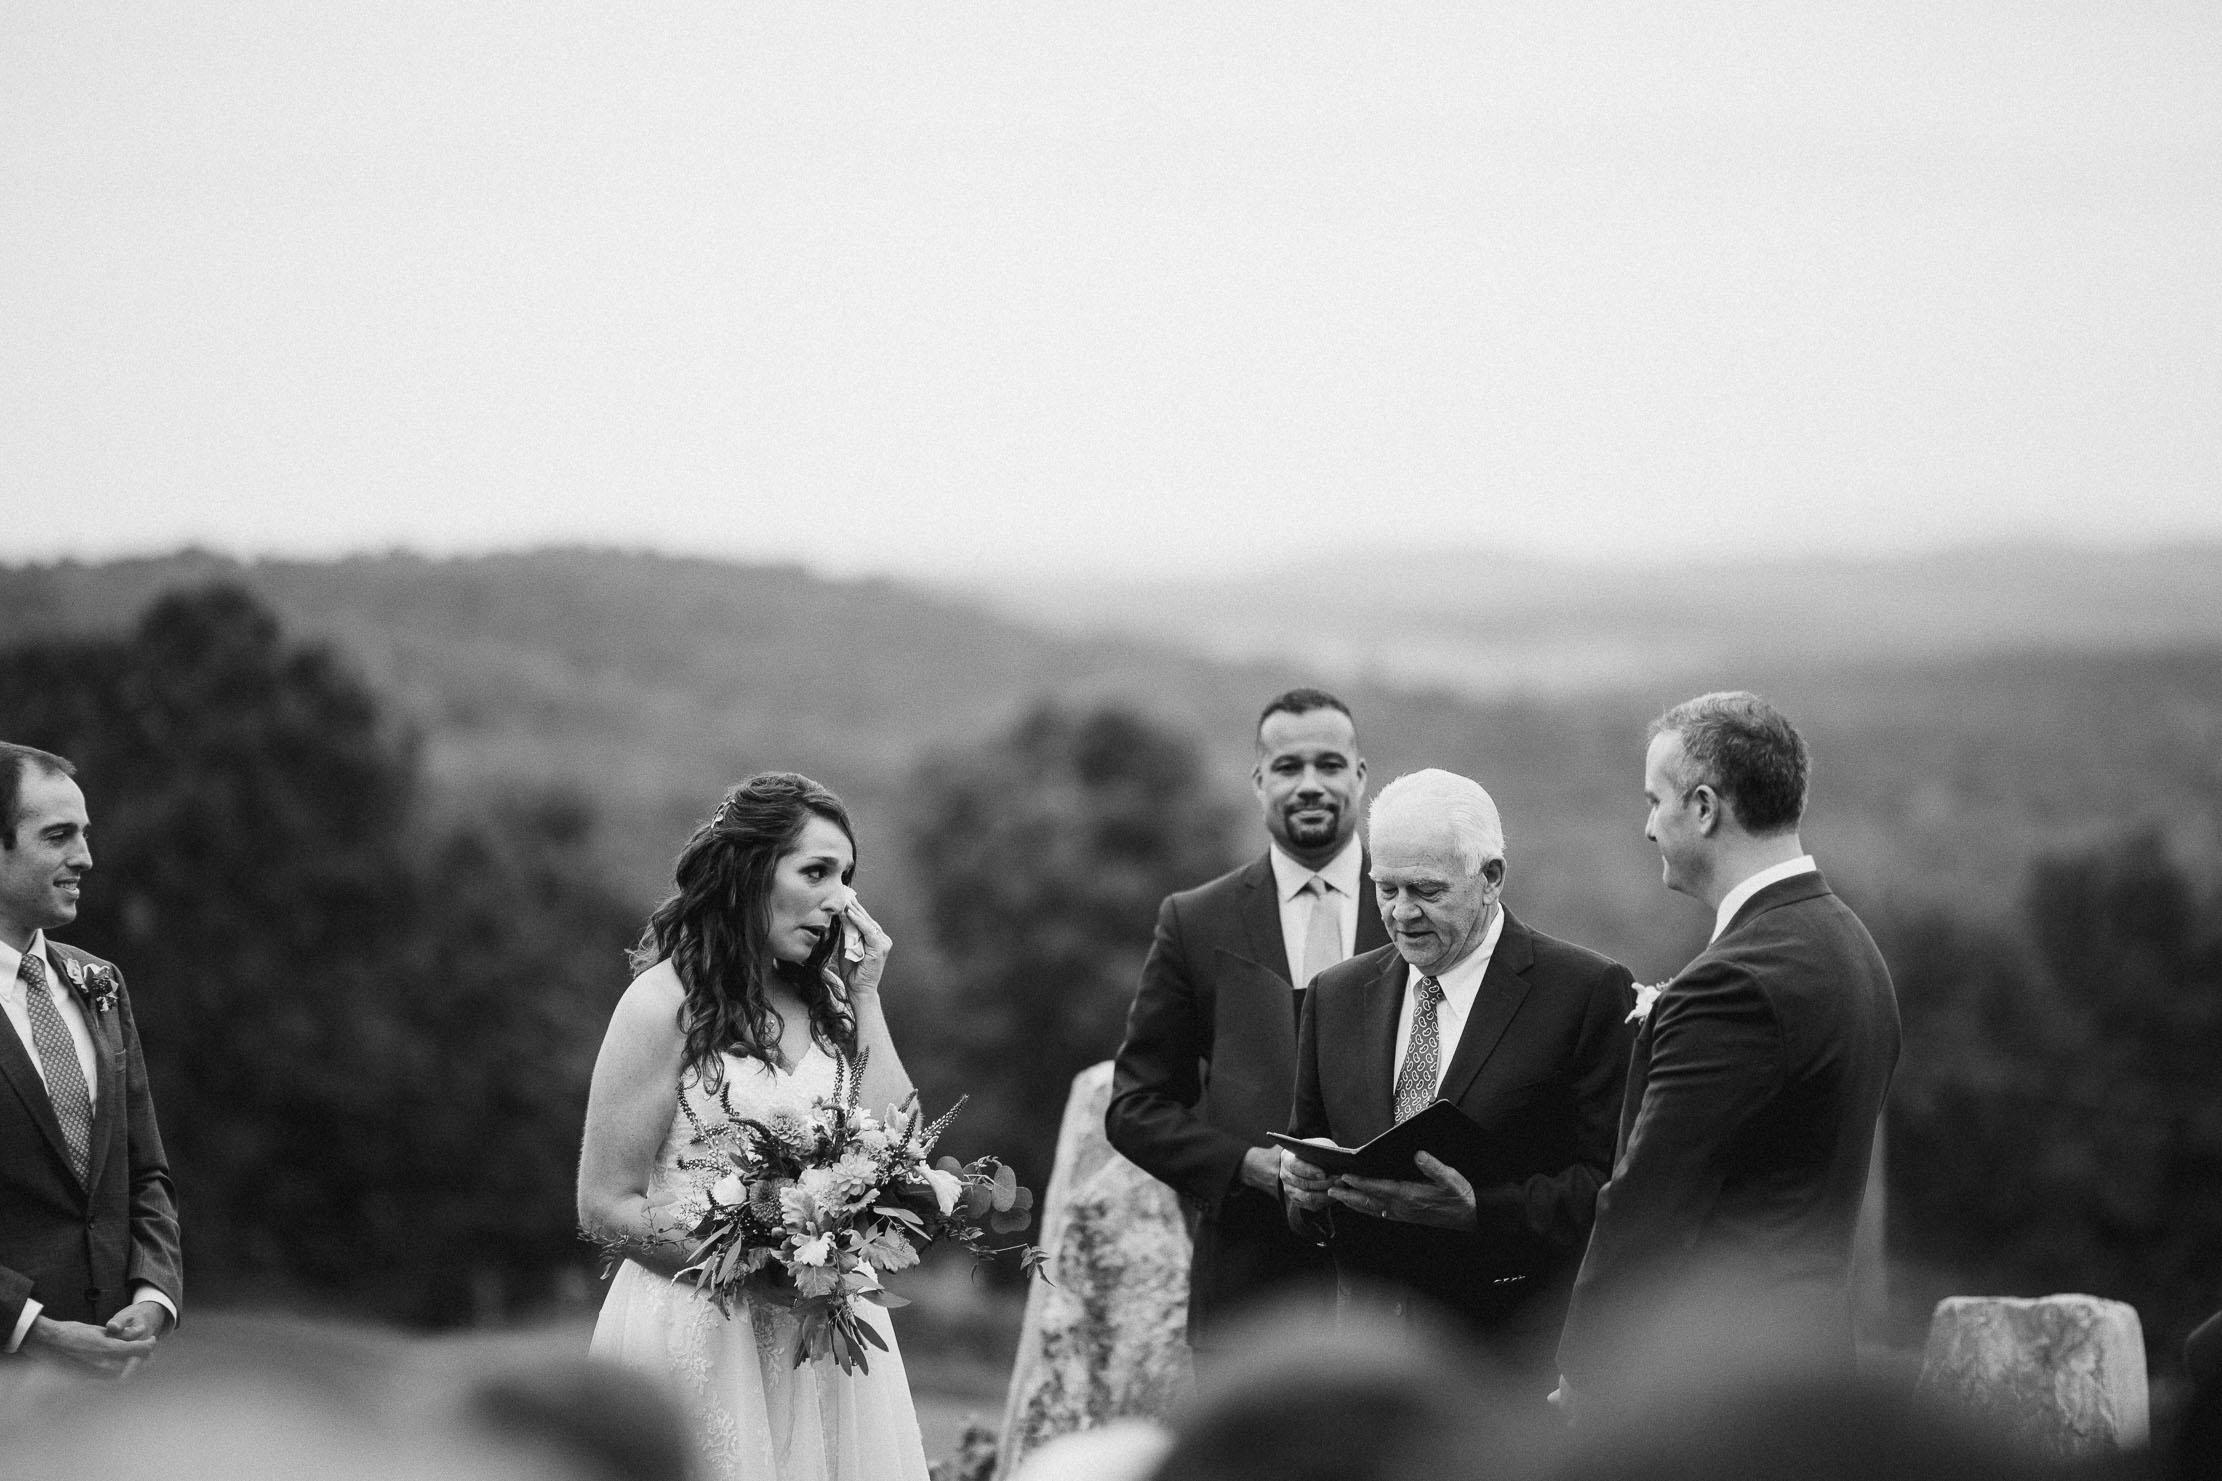 Wings-Castle-Millbrook-NY-Upstate-Wedding-Photographer-1090.jpg